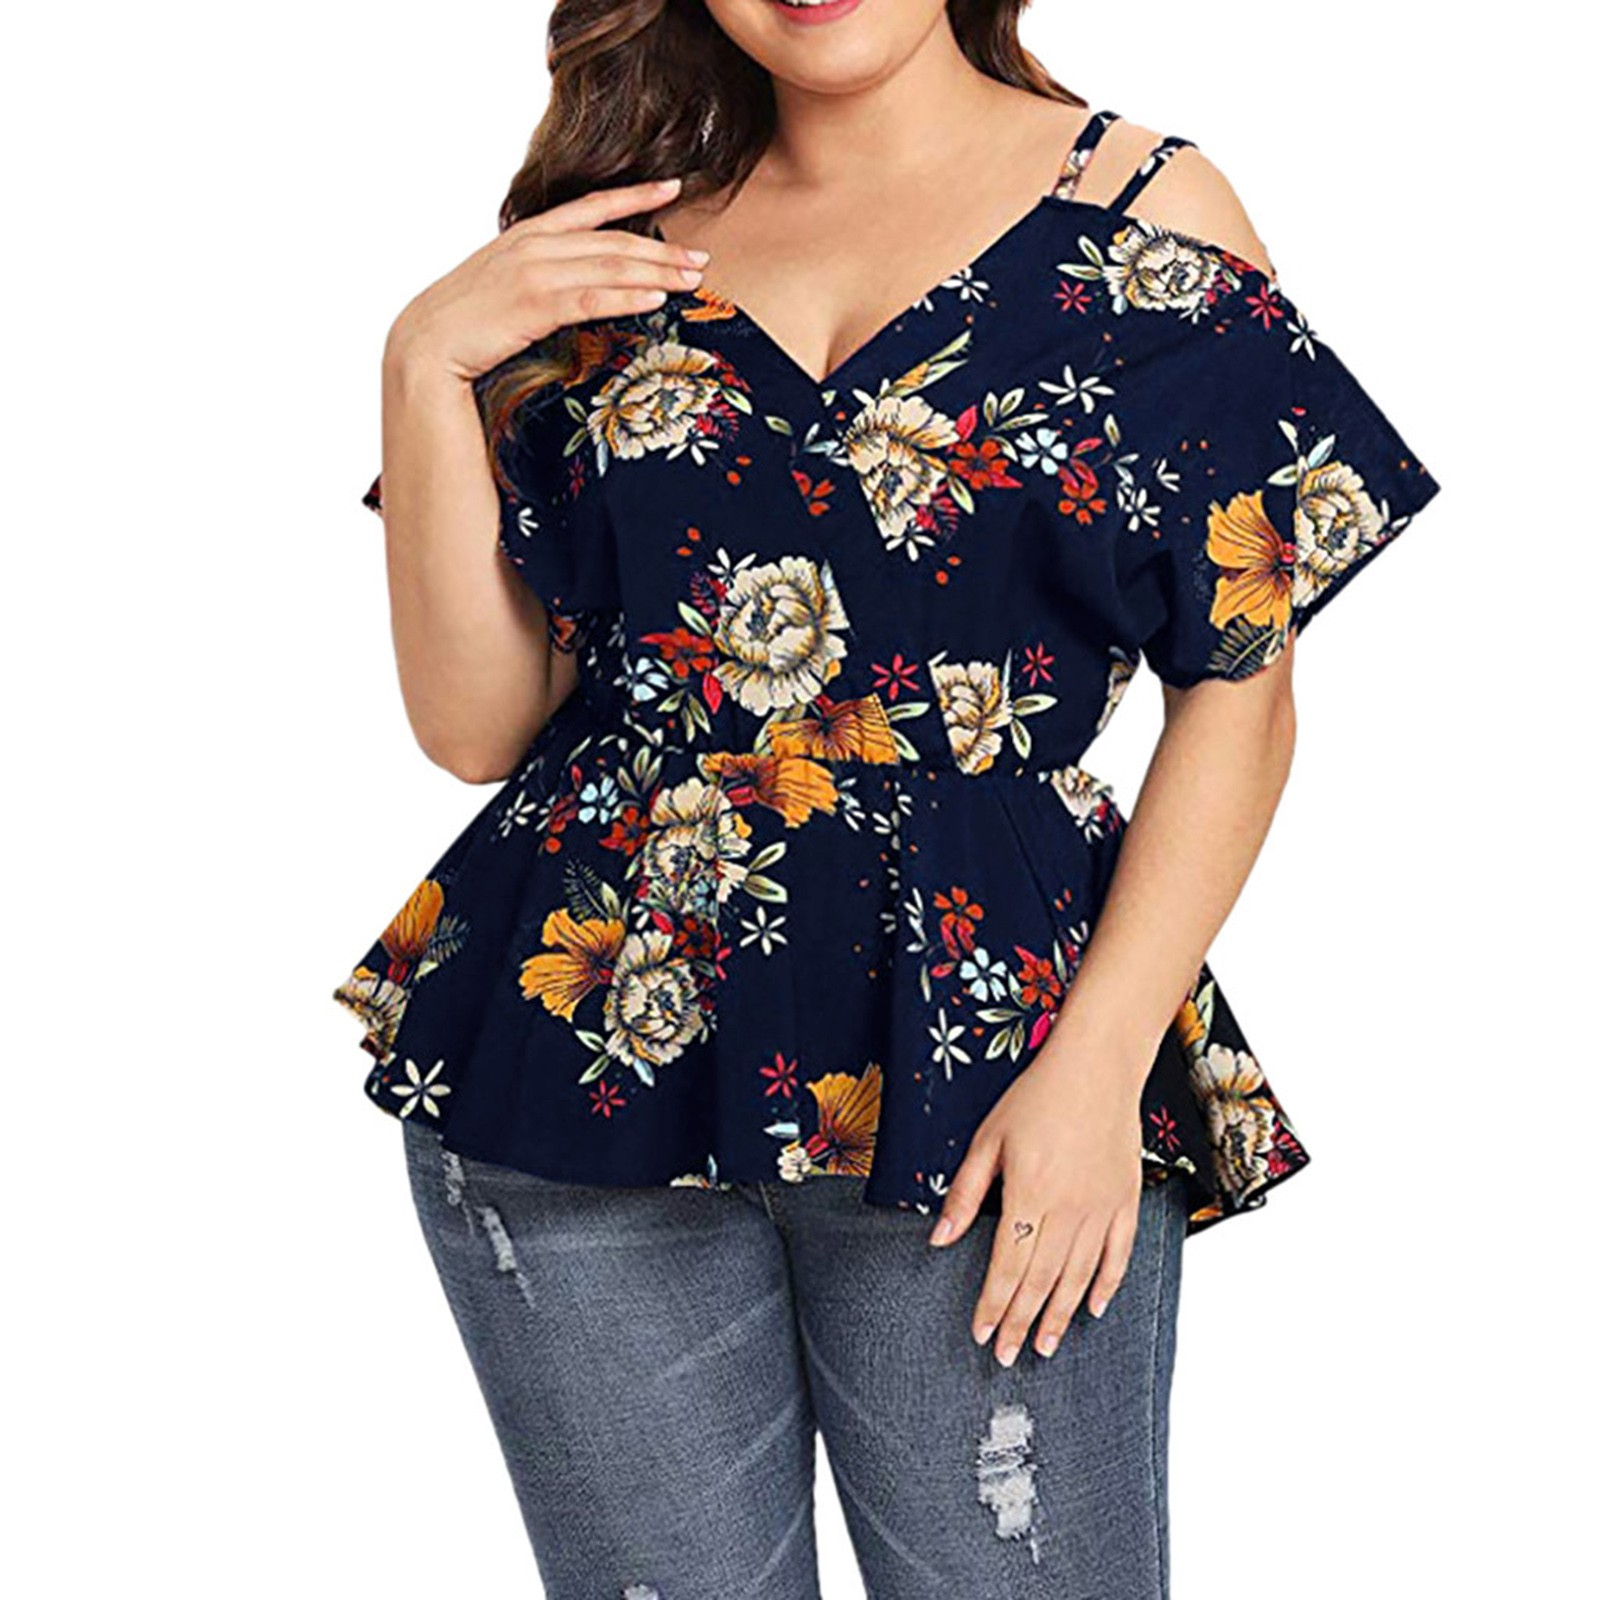 Women's 5xl Plus Size Tunic Shirt V neck Short Sleeve Shirts Strapless Floral Printed Summer Top Blouse For Women Блузка Женская